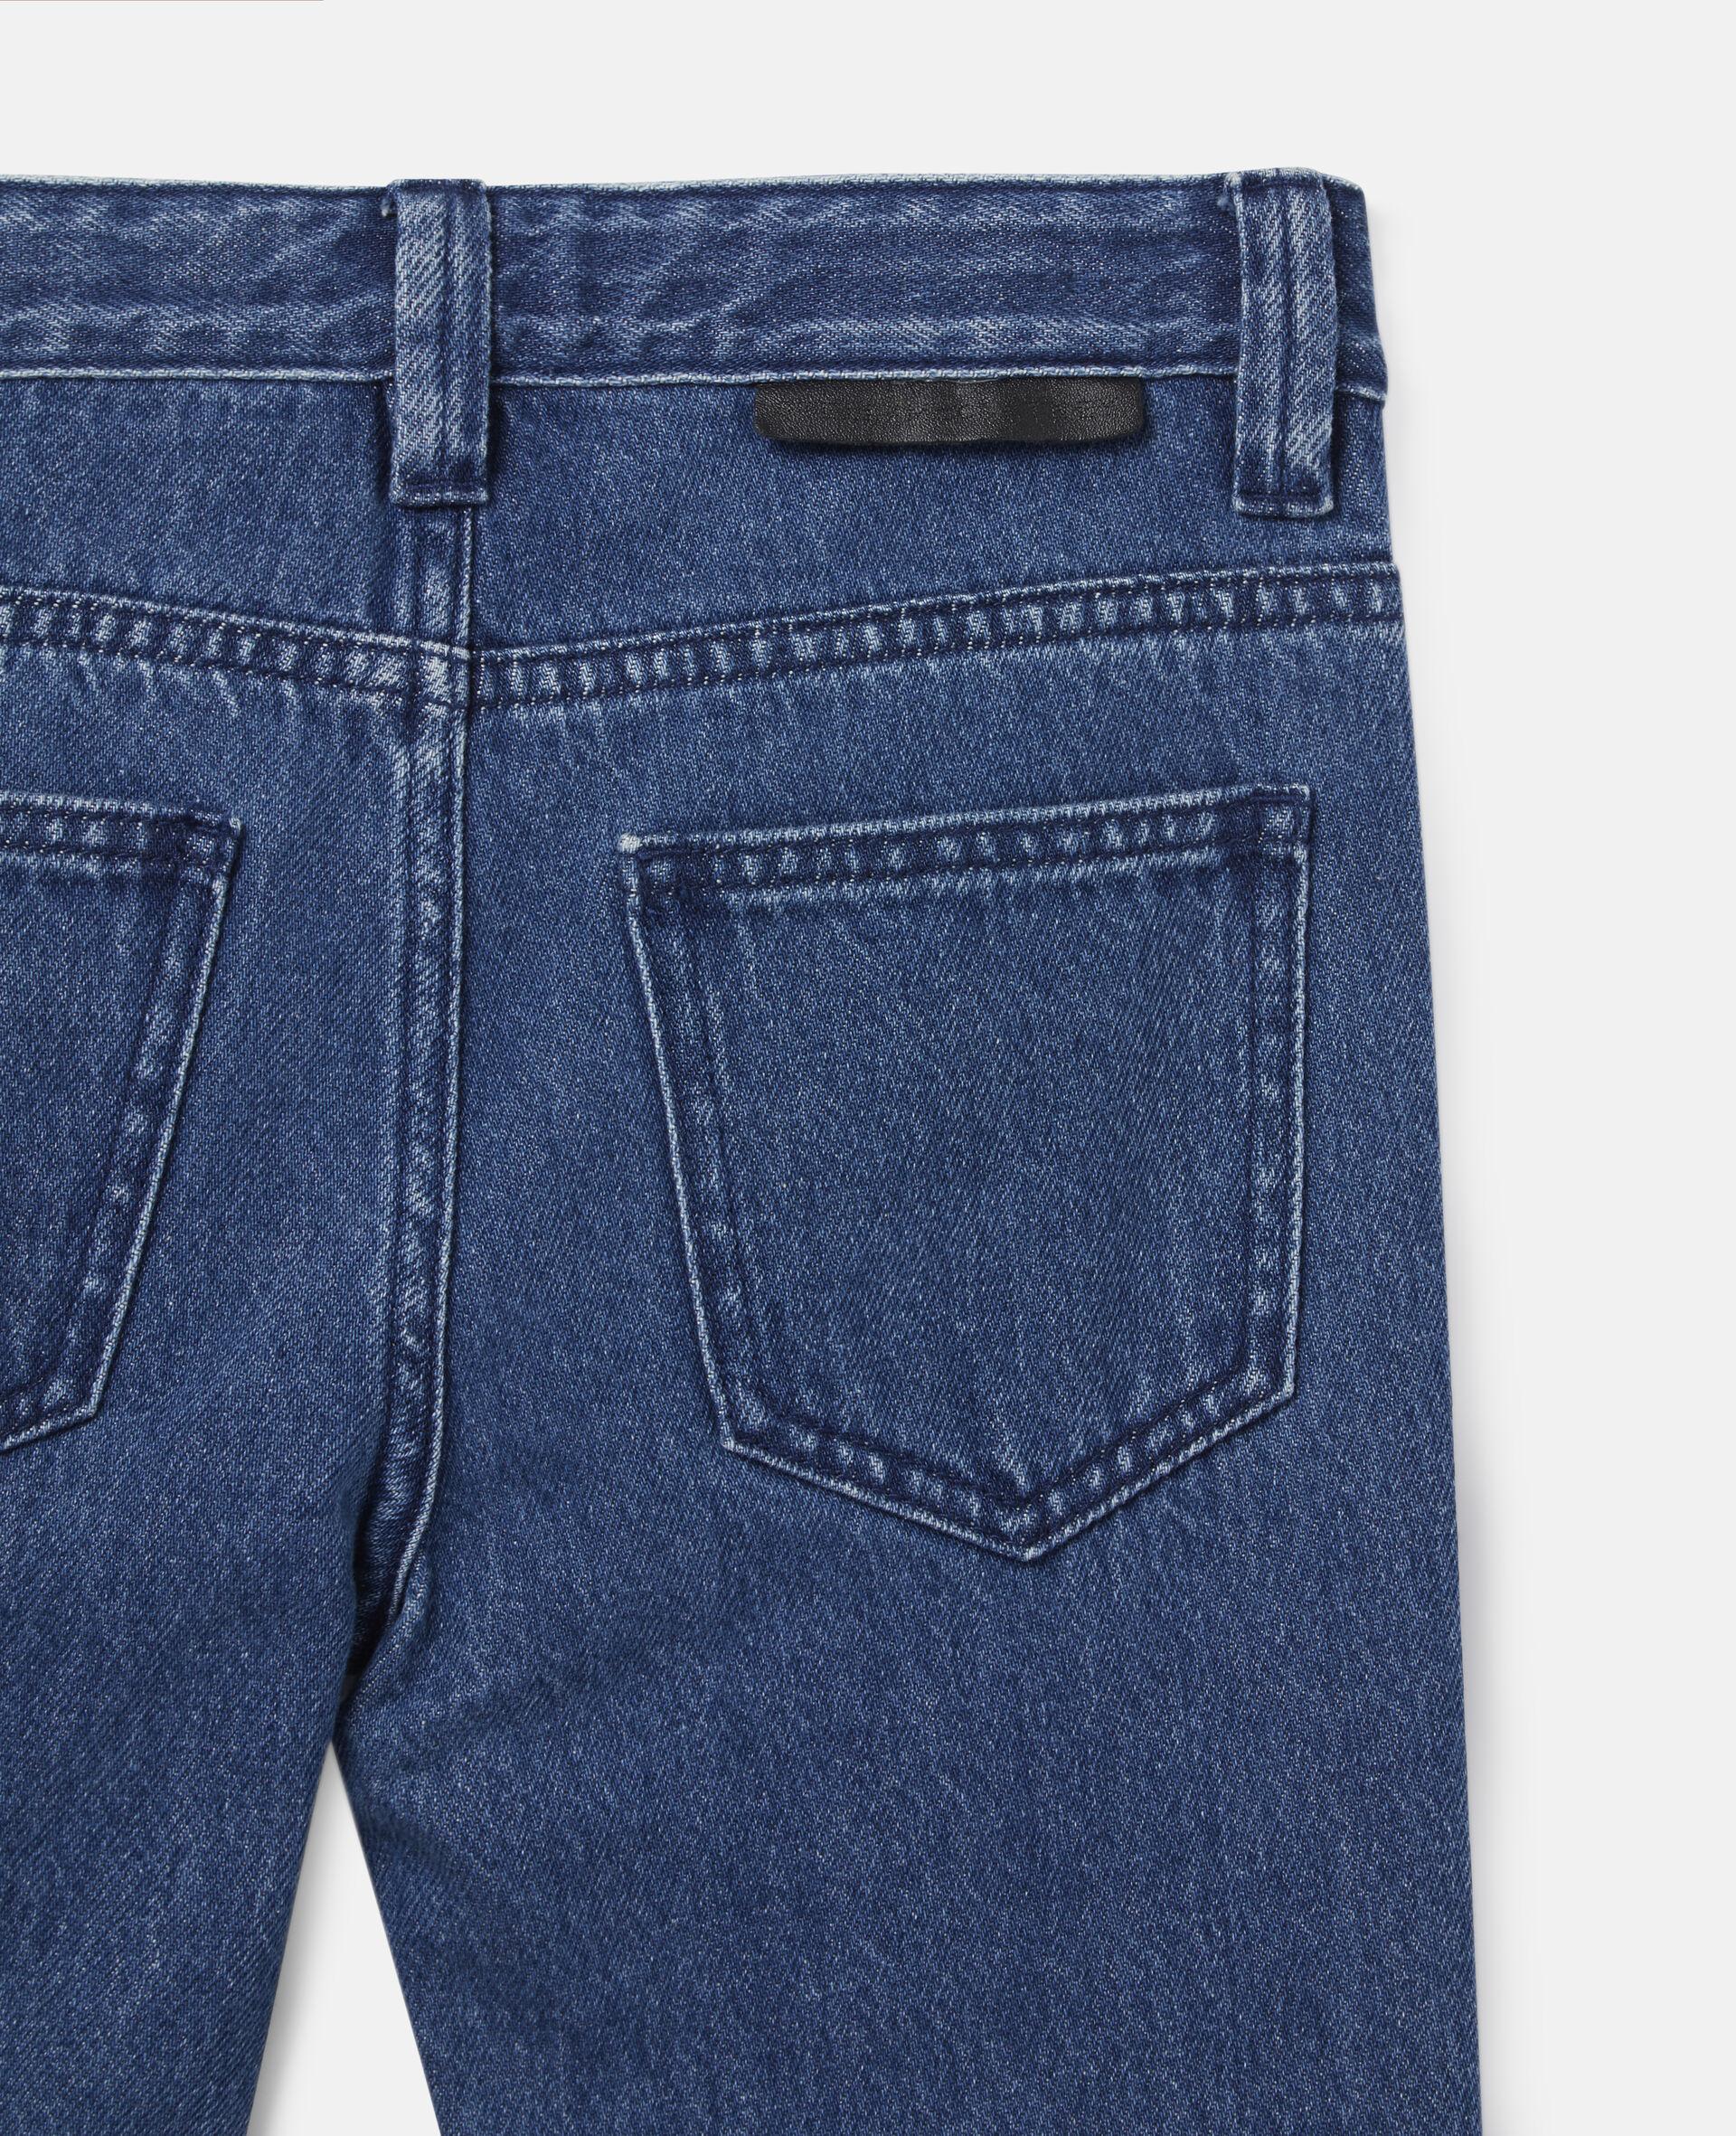 Denim Trousers-Blue-large image number 1